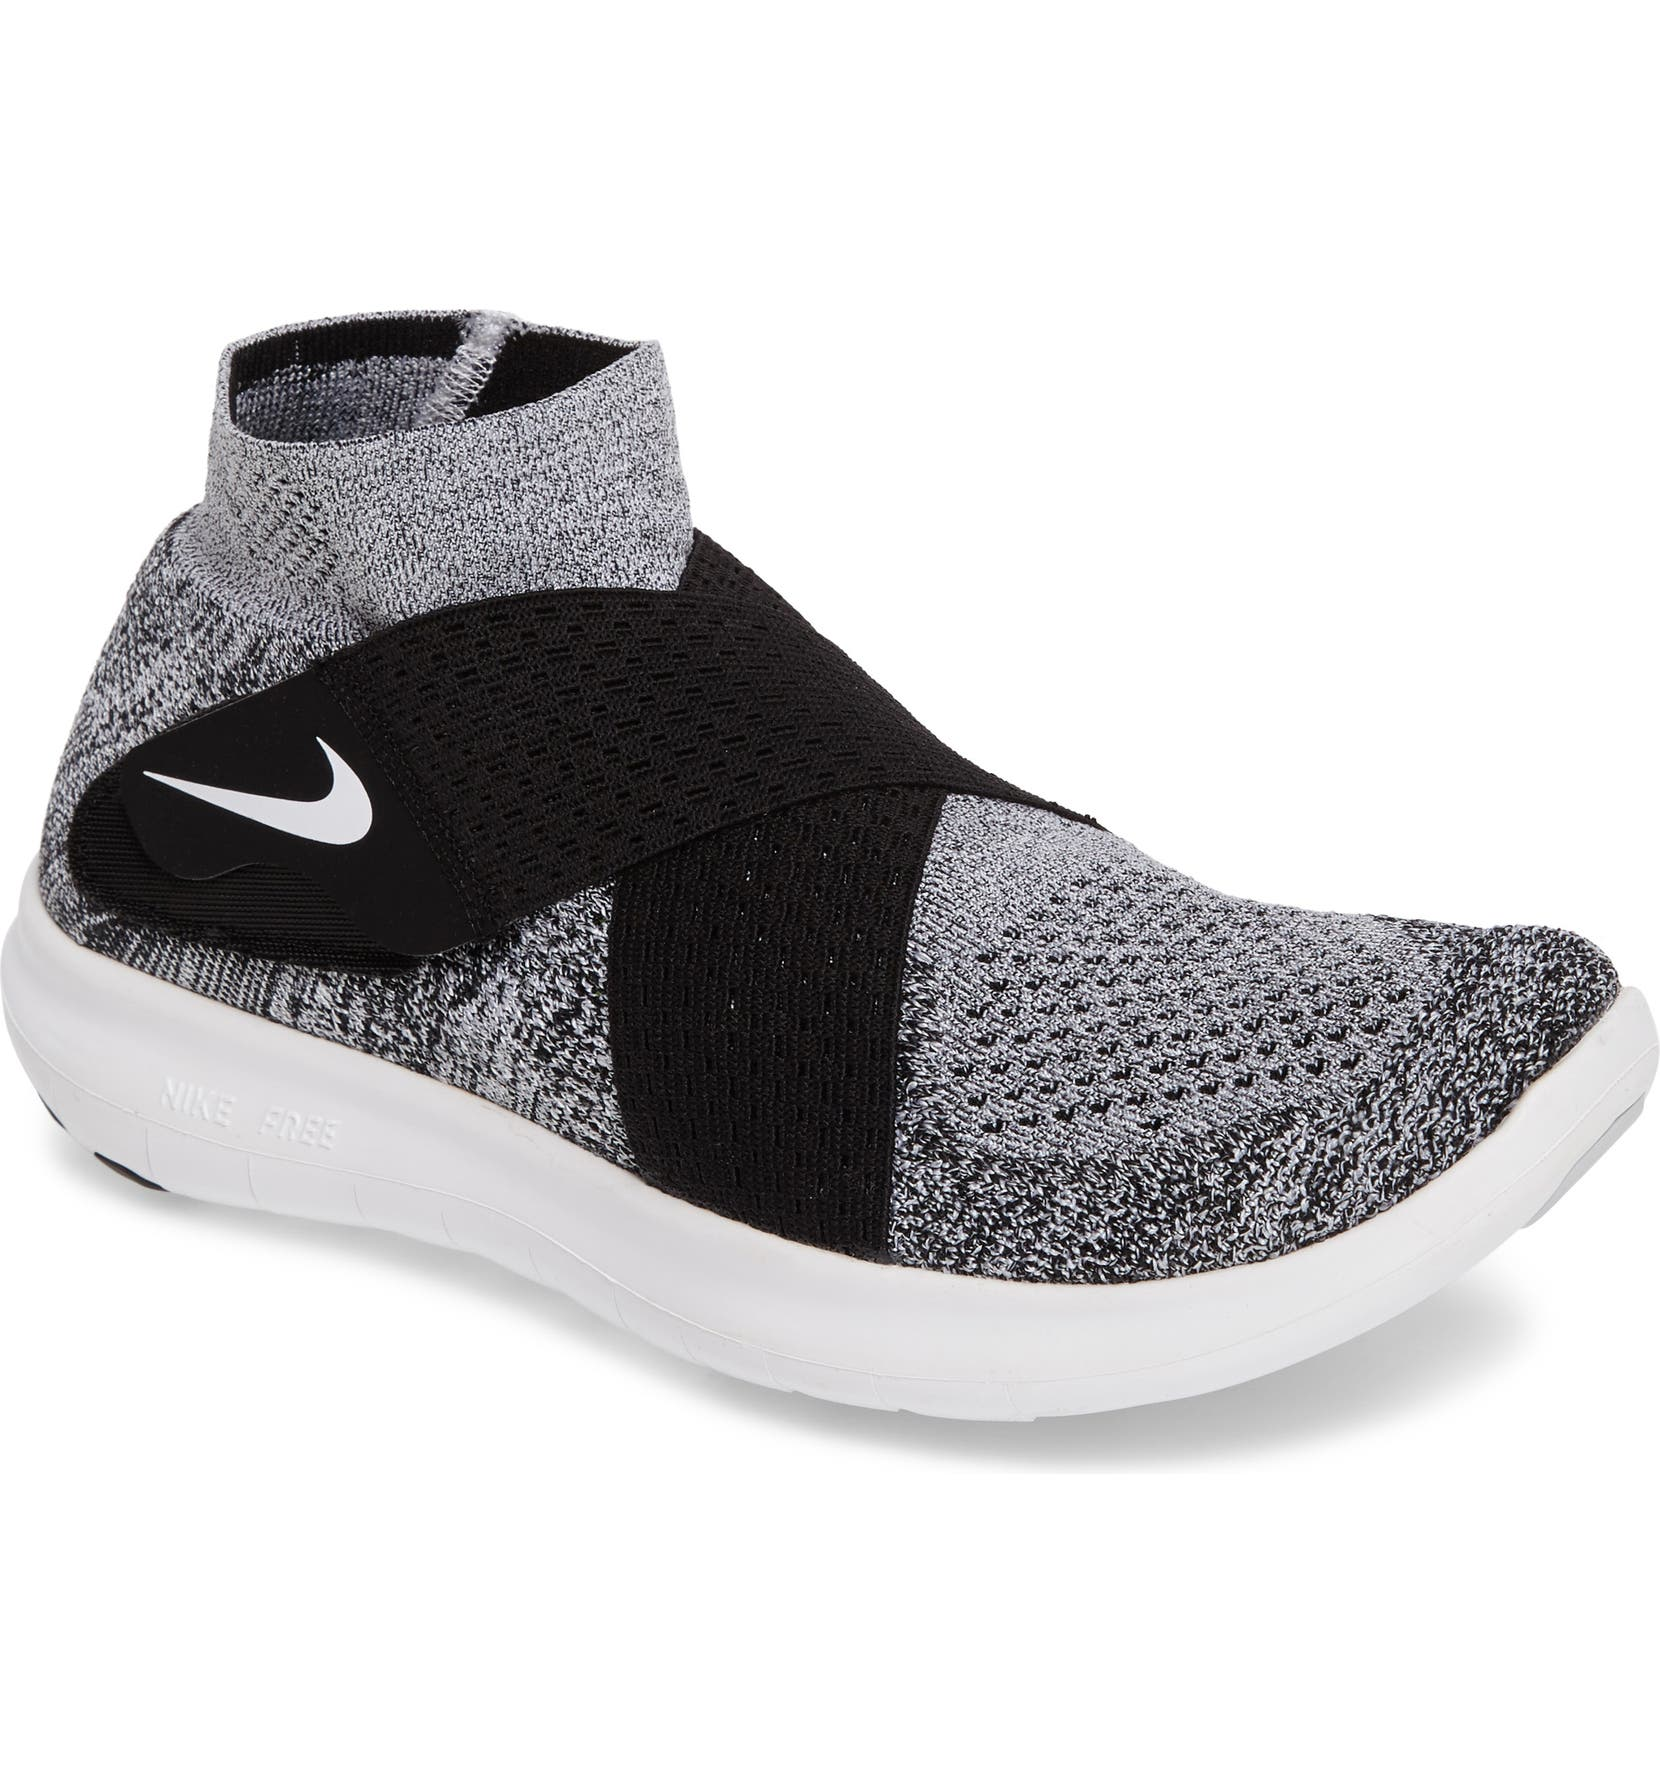 29694b7fdc2 Nike Free RN Motion Flyknit 2 Running Shoe (Men)